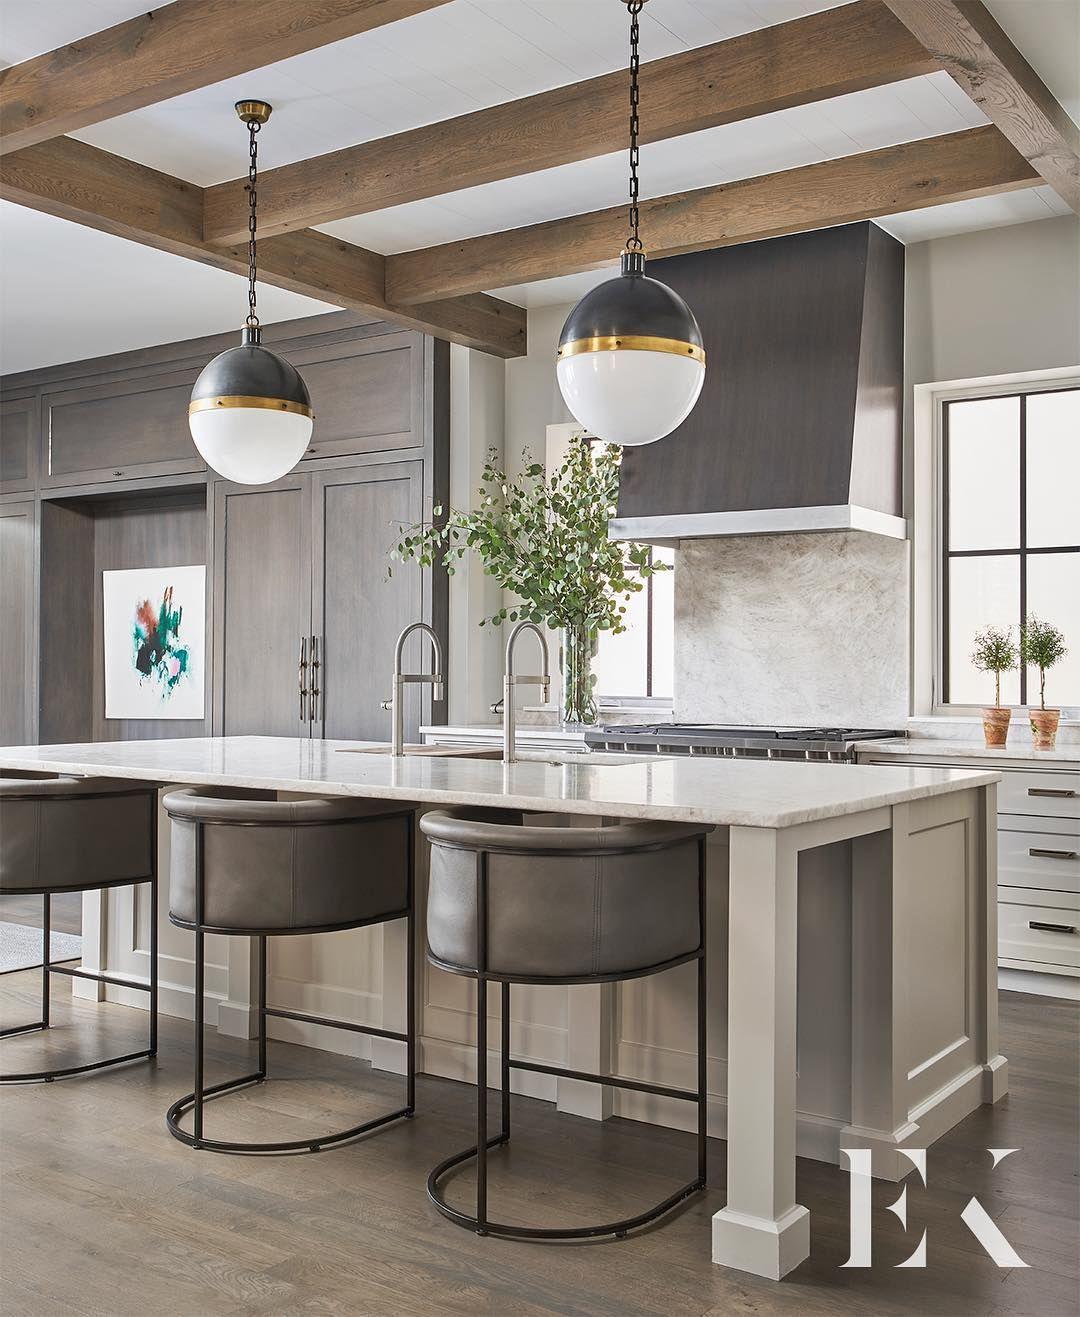 Pin de Amber Gunst en I Dream of Kitchens | Pinterest | Cocinas ...